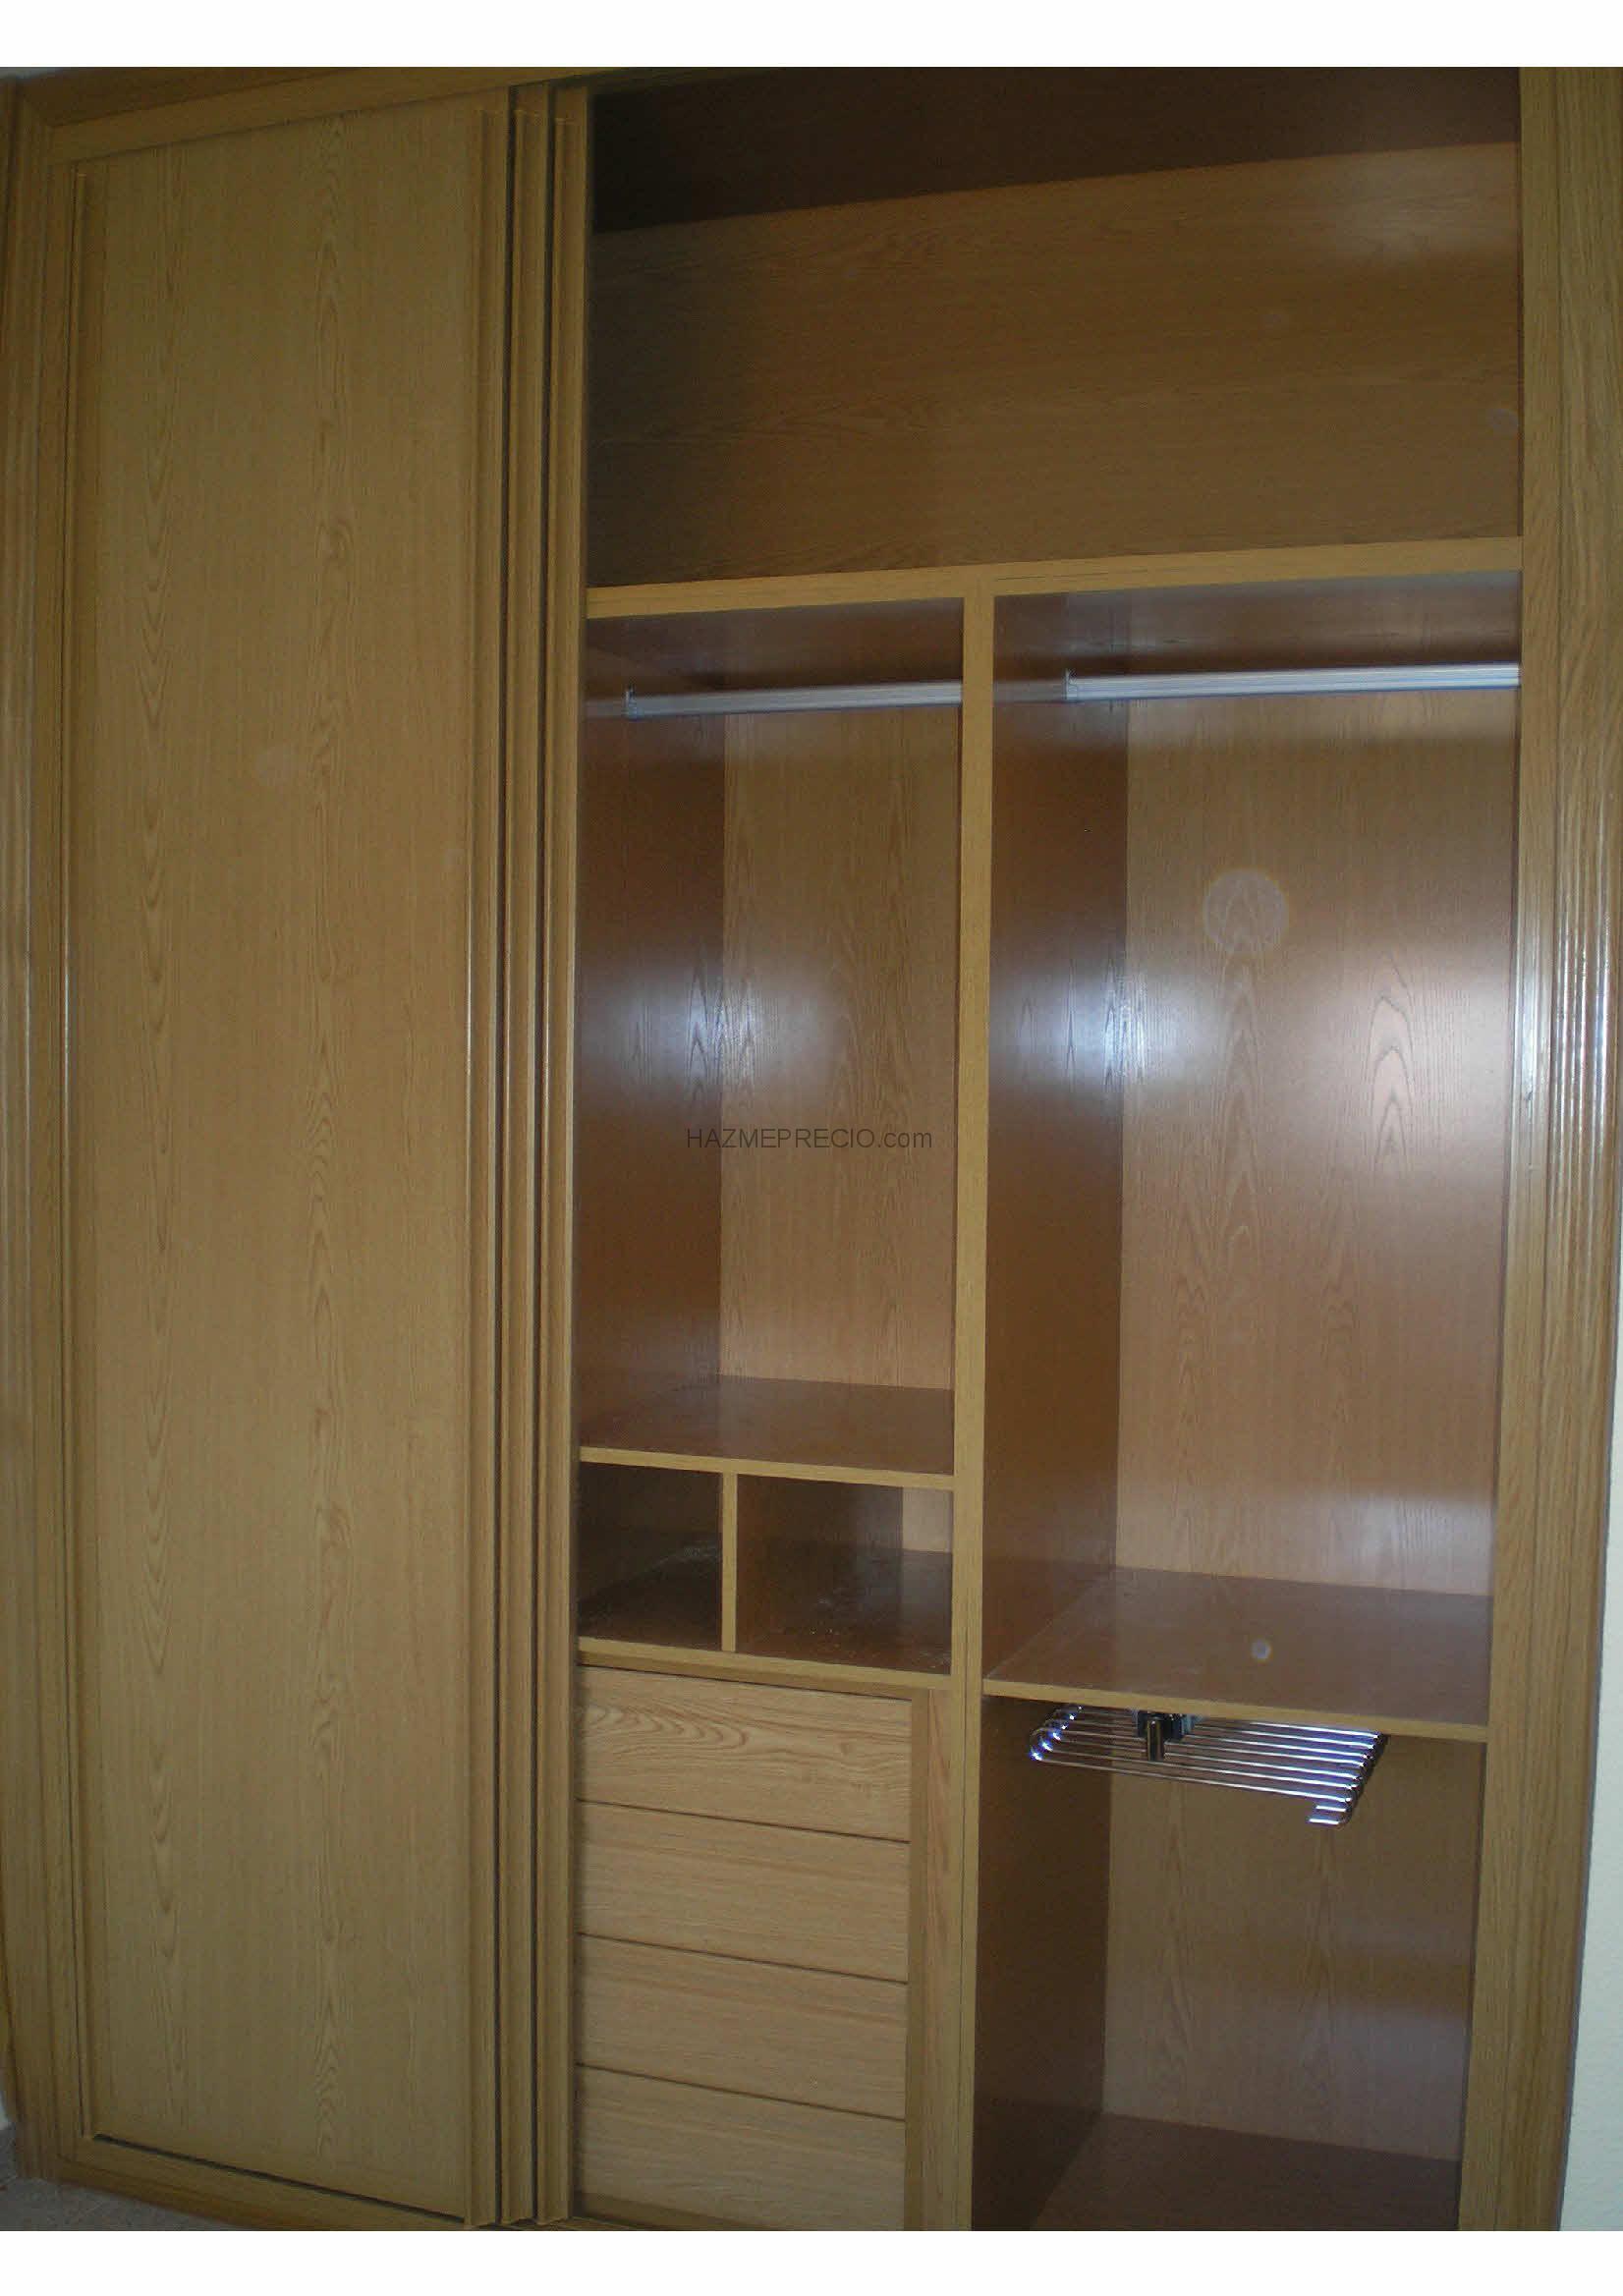 Papel para forrar armarios por fuera elegant estanteras for Papel para forrar armarios empotrados